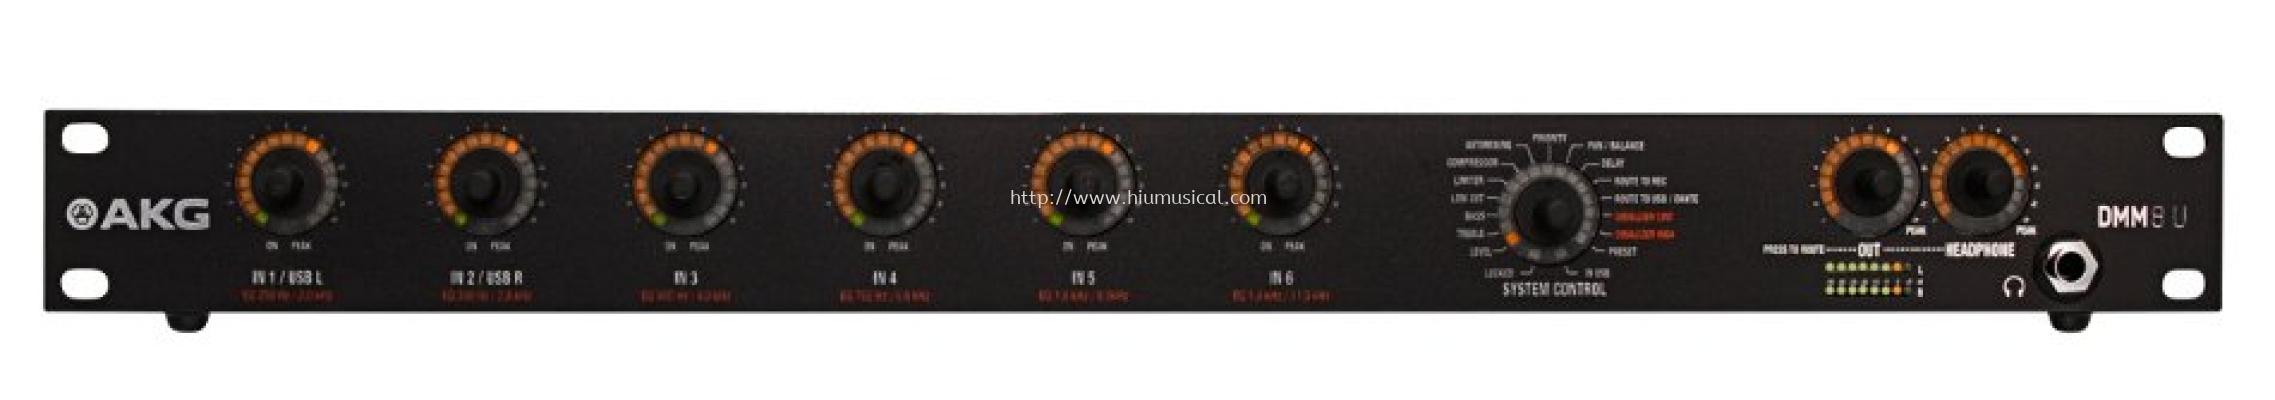 AKG DMM8 U Digital Automatic Microphone Mixer